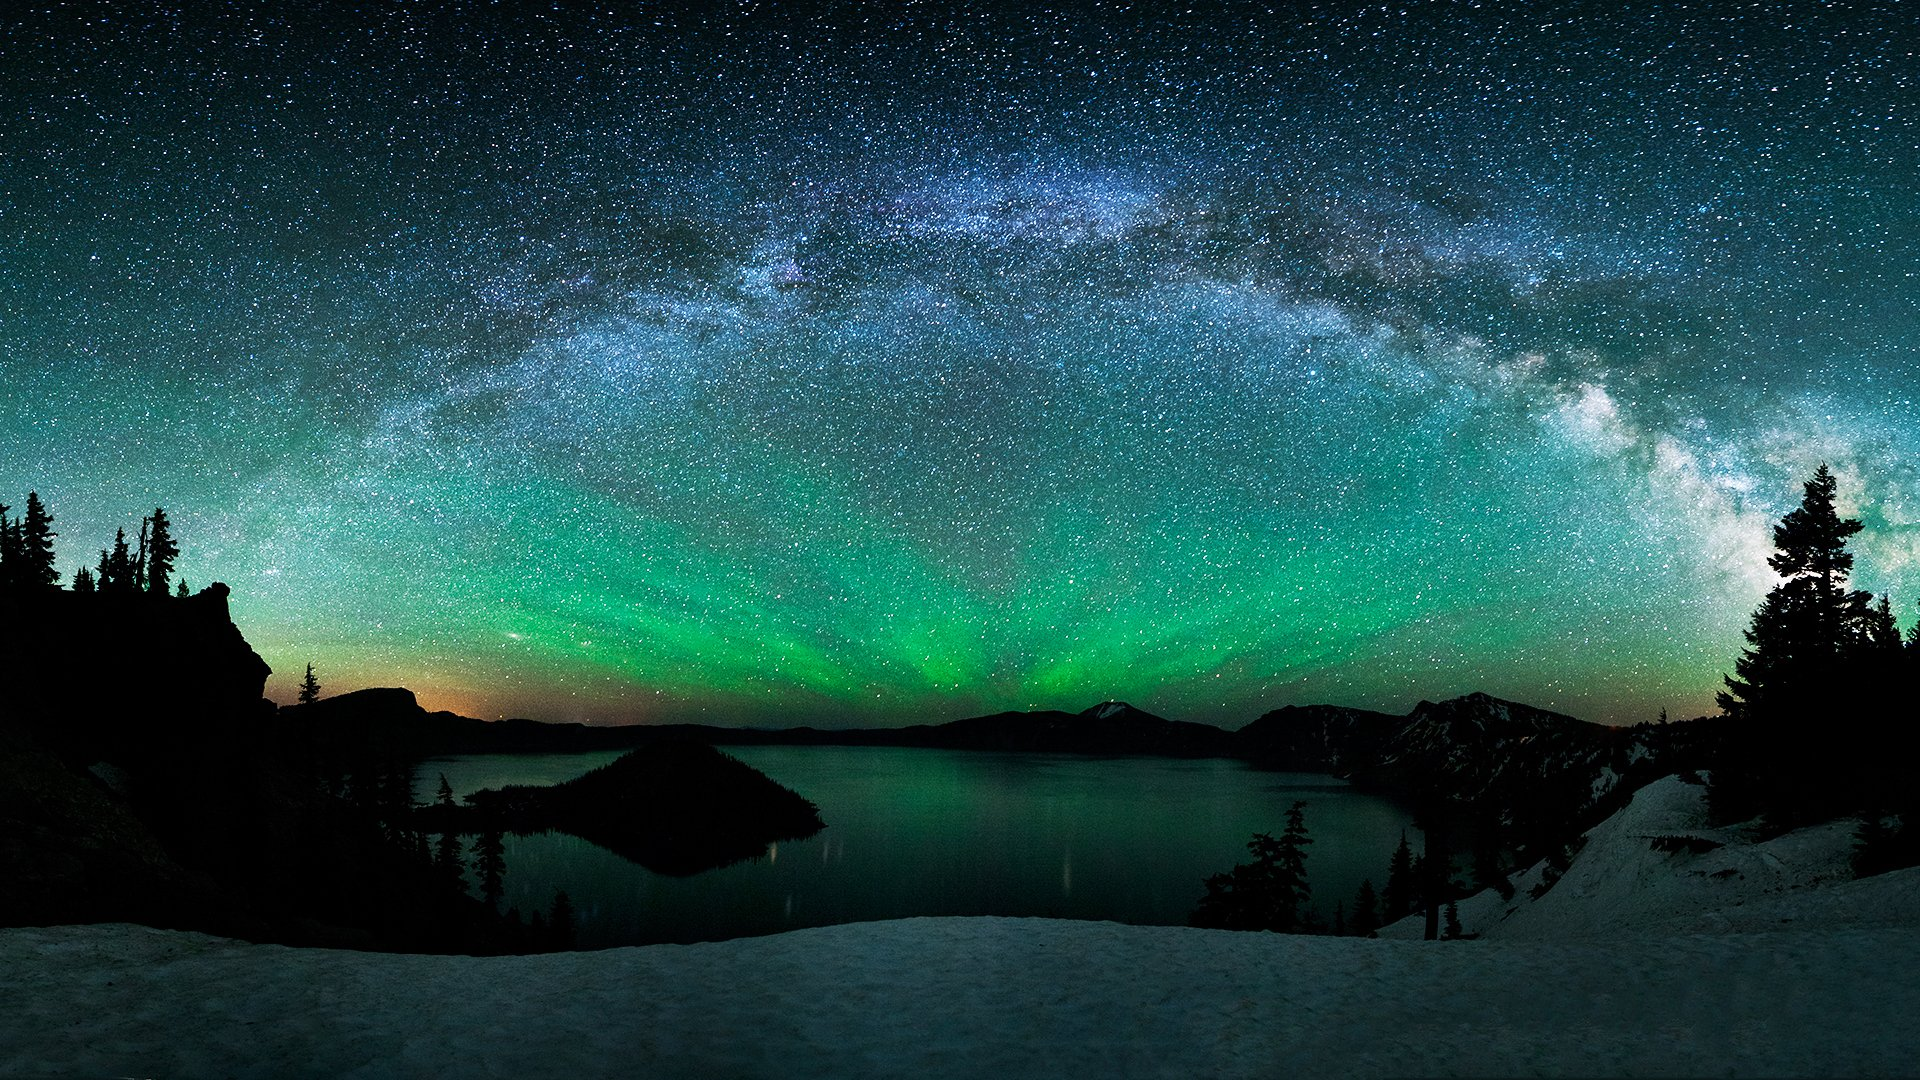 Aurora borealis over winter lake hd wallpaper sfondi for Sfondi desktop aurora boreale